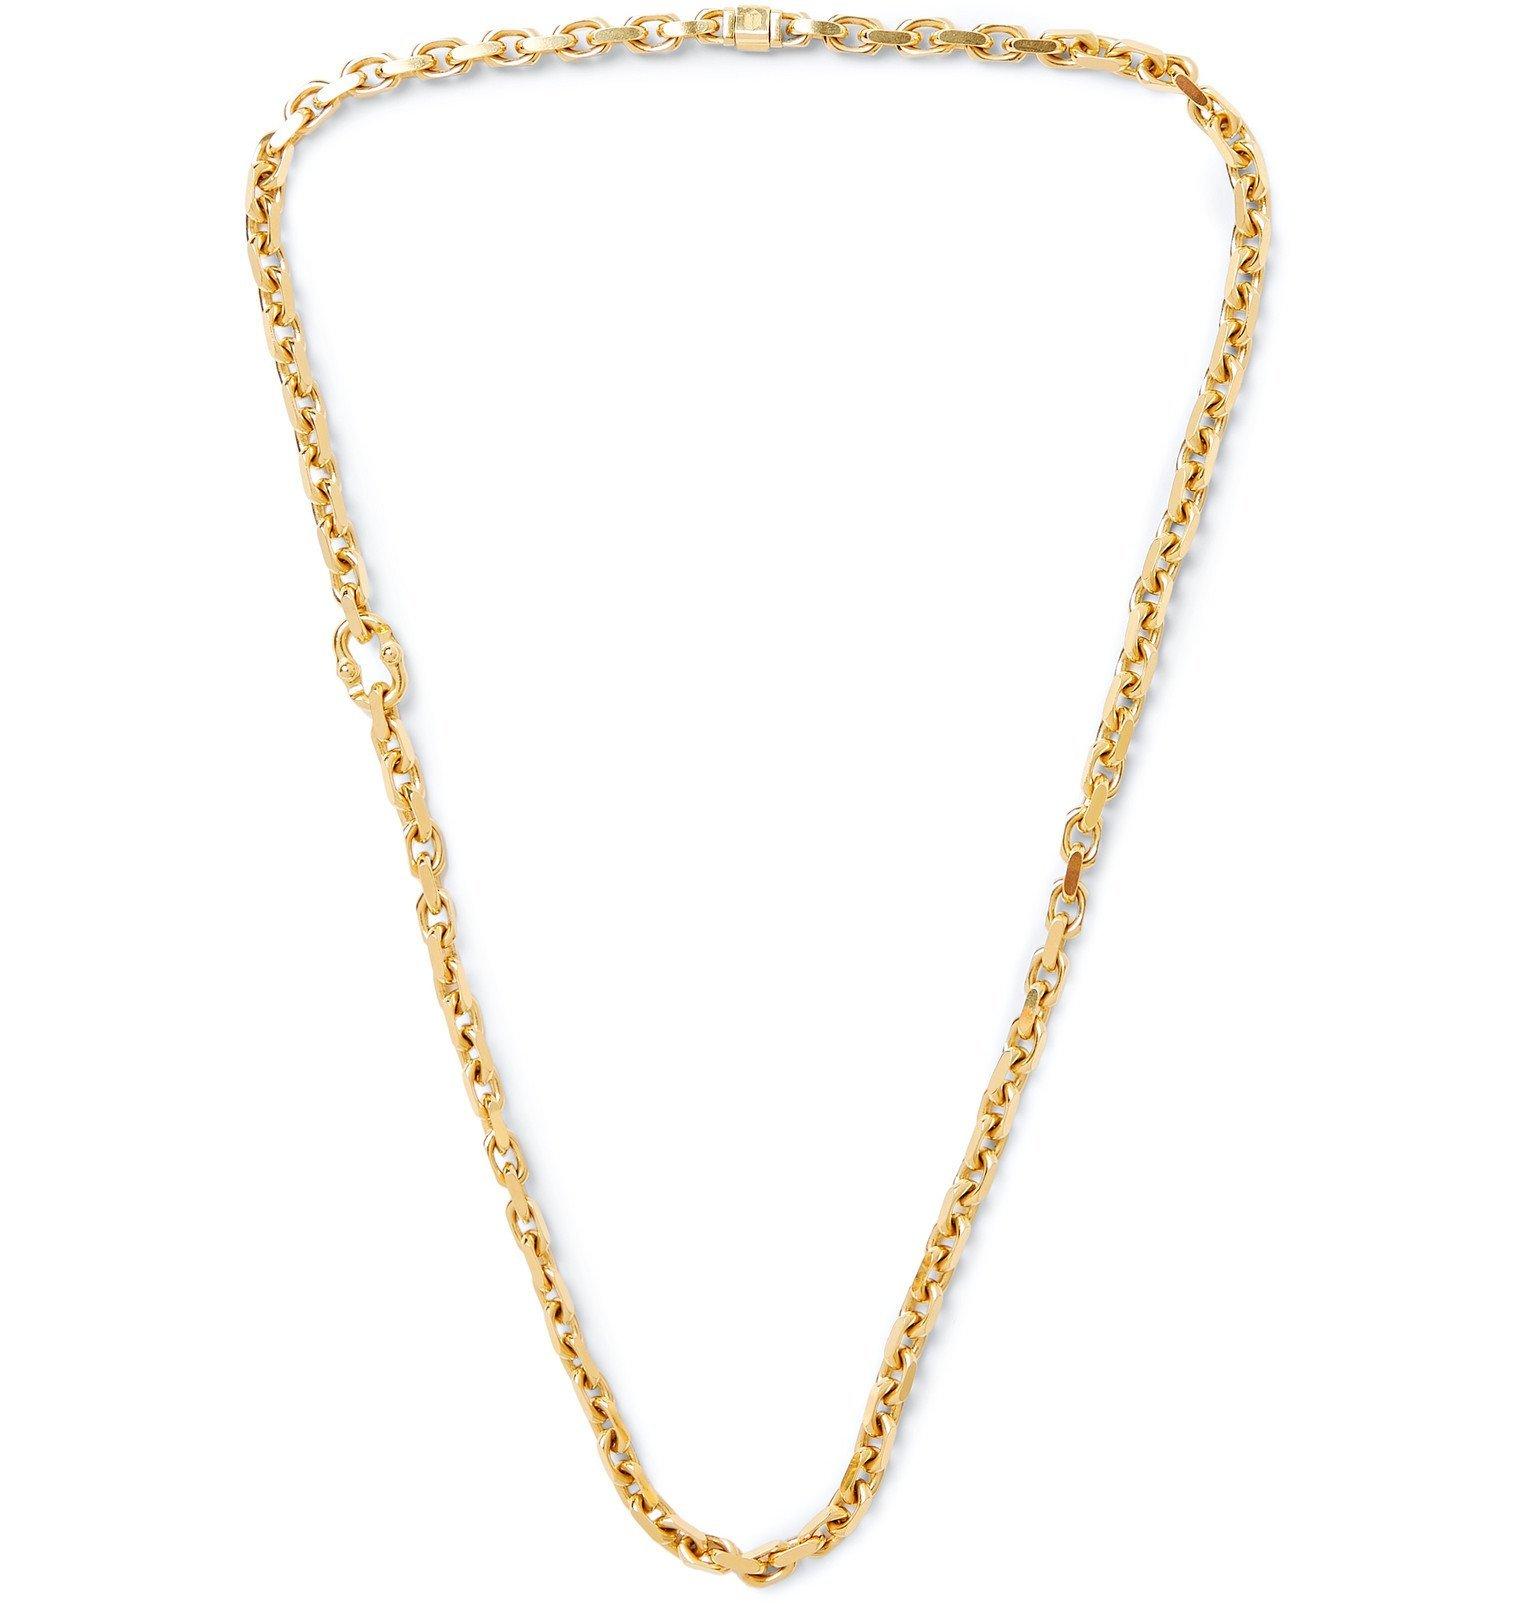 Photo: Tiffany & Co. - Tiffany 1837 Makers 18-Karat Gold Necklace - Gold